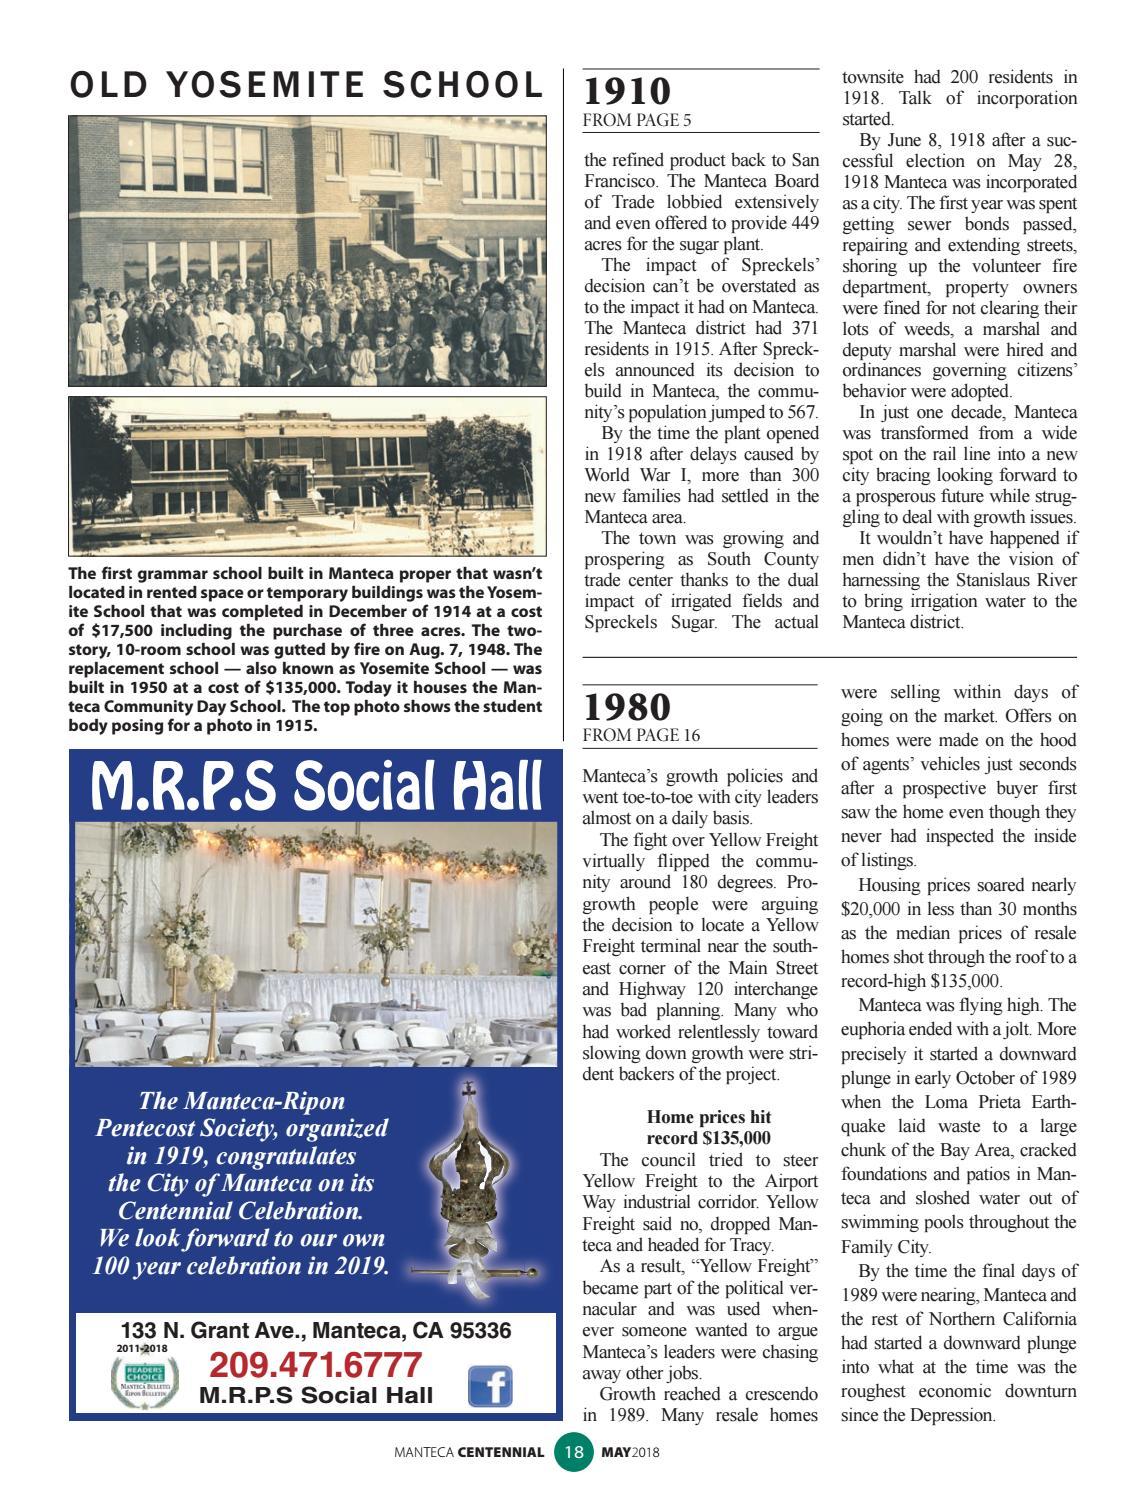 Manteca Centennial 2018 By Manteca Bulletin Issuu